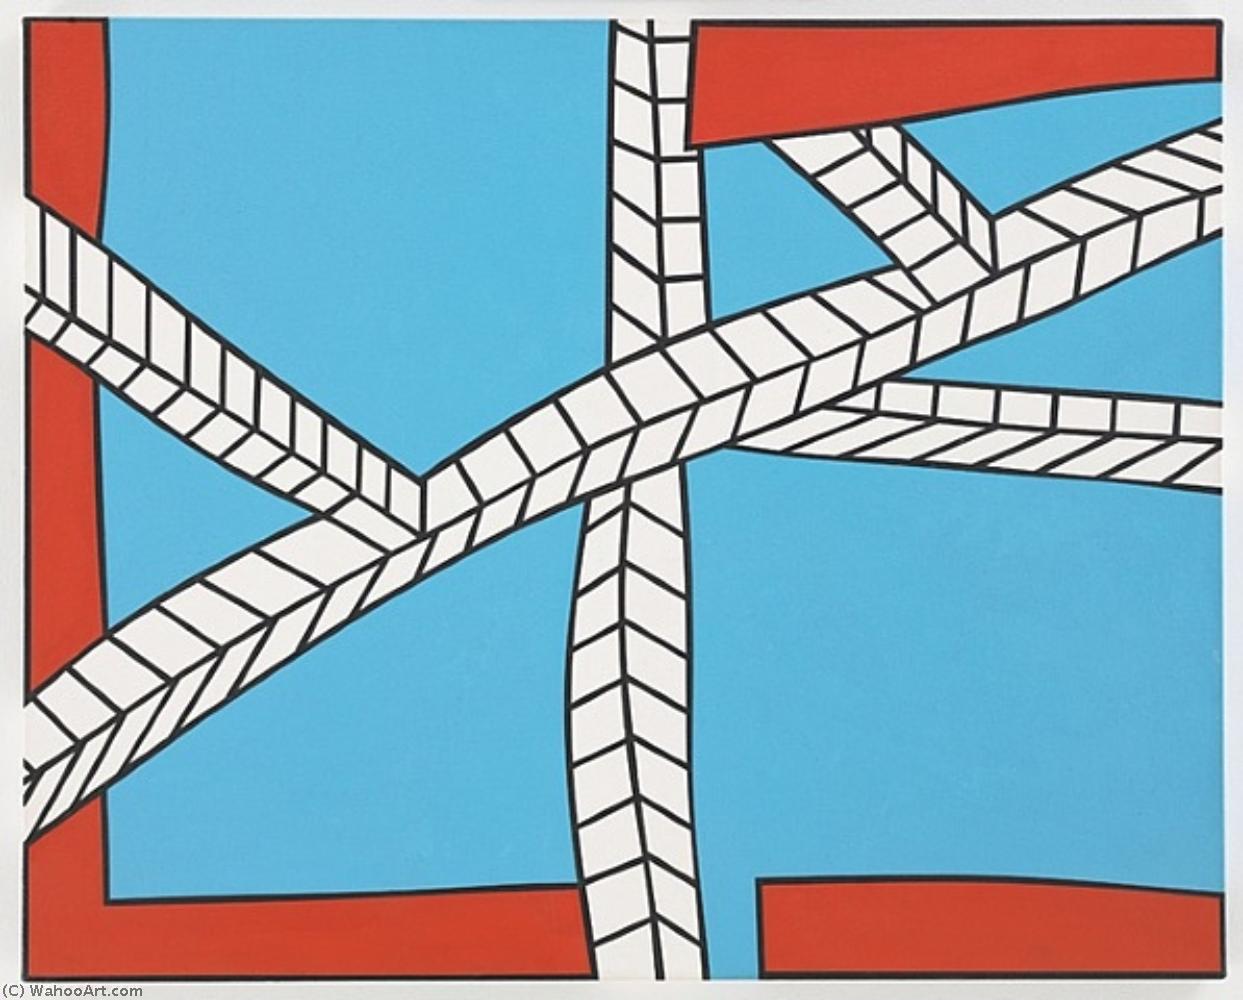 Wikioo.org - The Encyclopedia of Fine Arts - Painting, Artwork by Nicholas Krushenick - Skyscape II